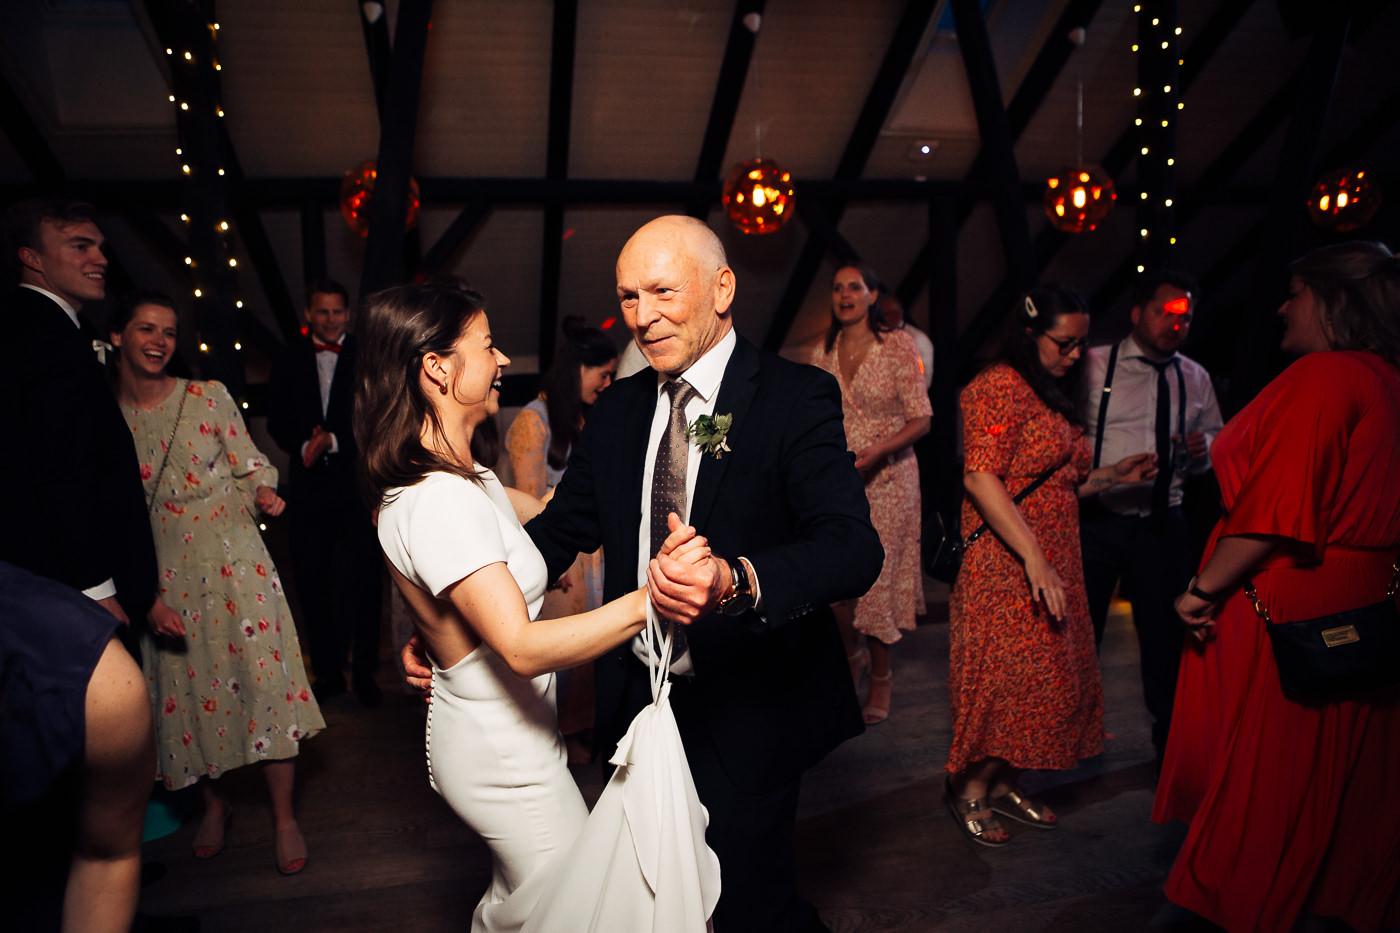 Malene & Ole Martin - elegant dansk- norskt bryllup i Oslo Bryllup Gamle Aker Oslo 3 Akershus